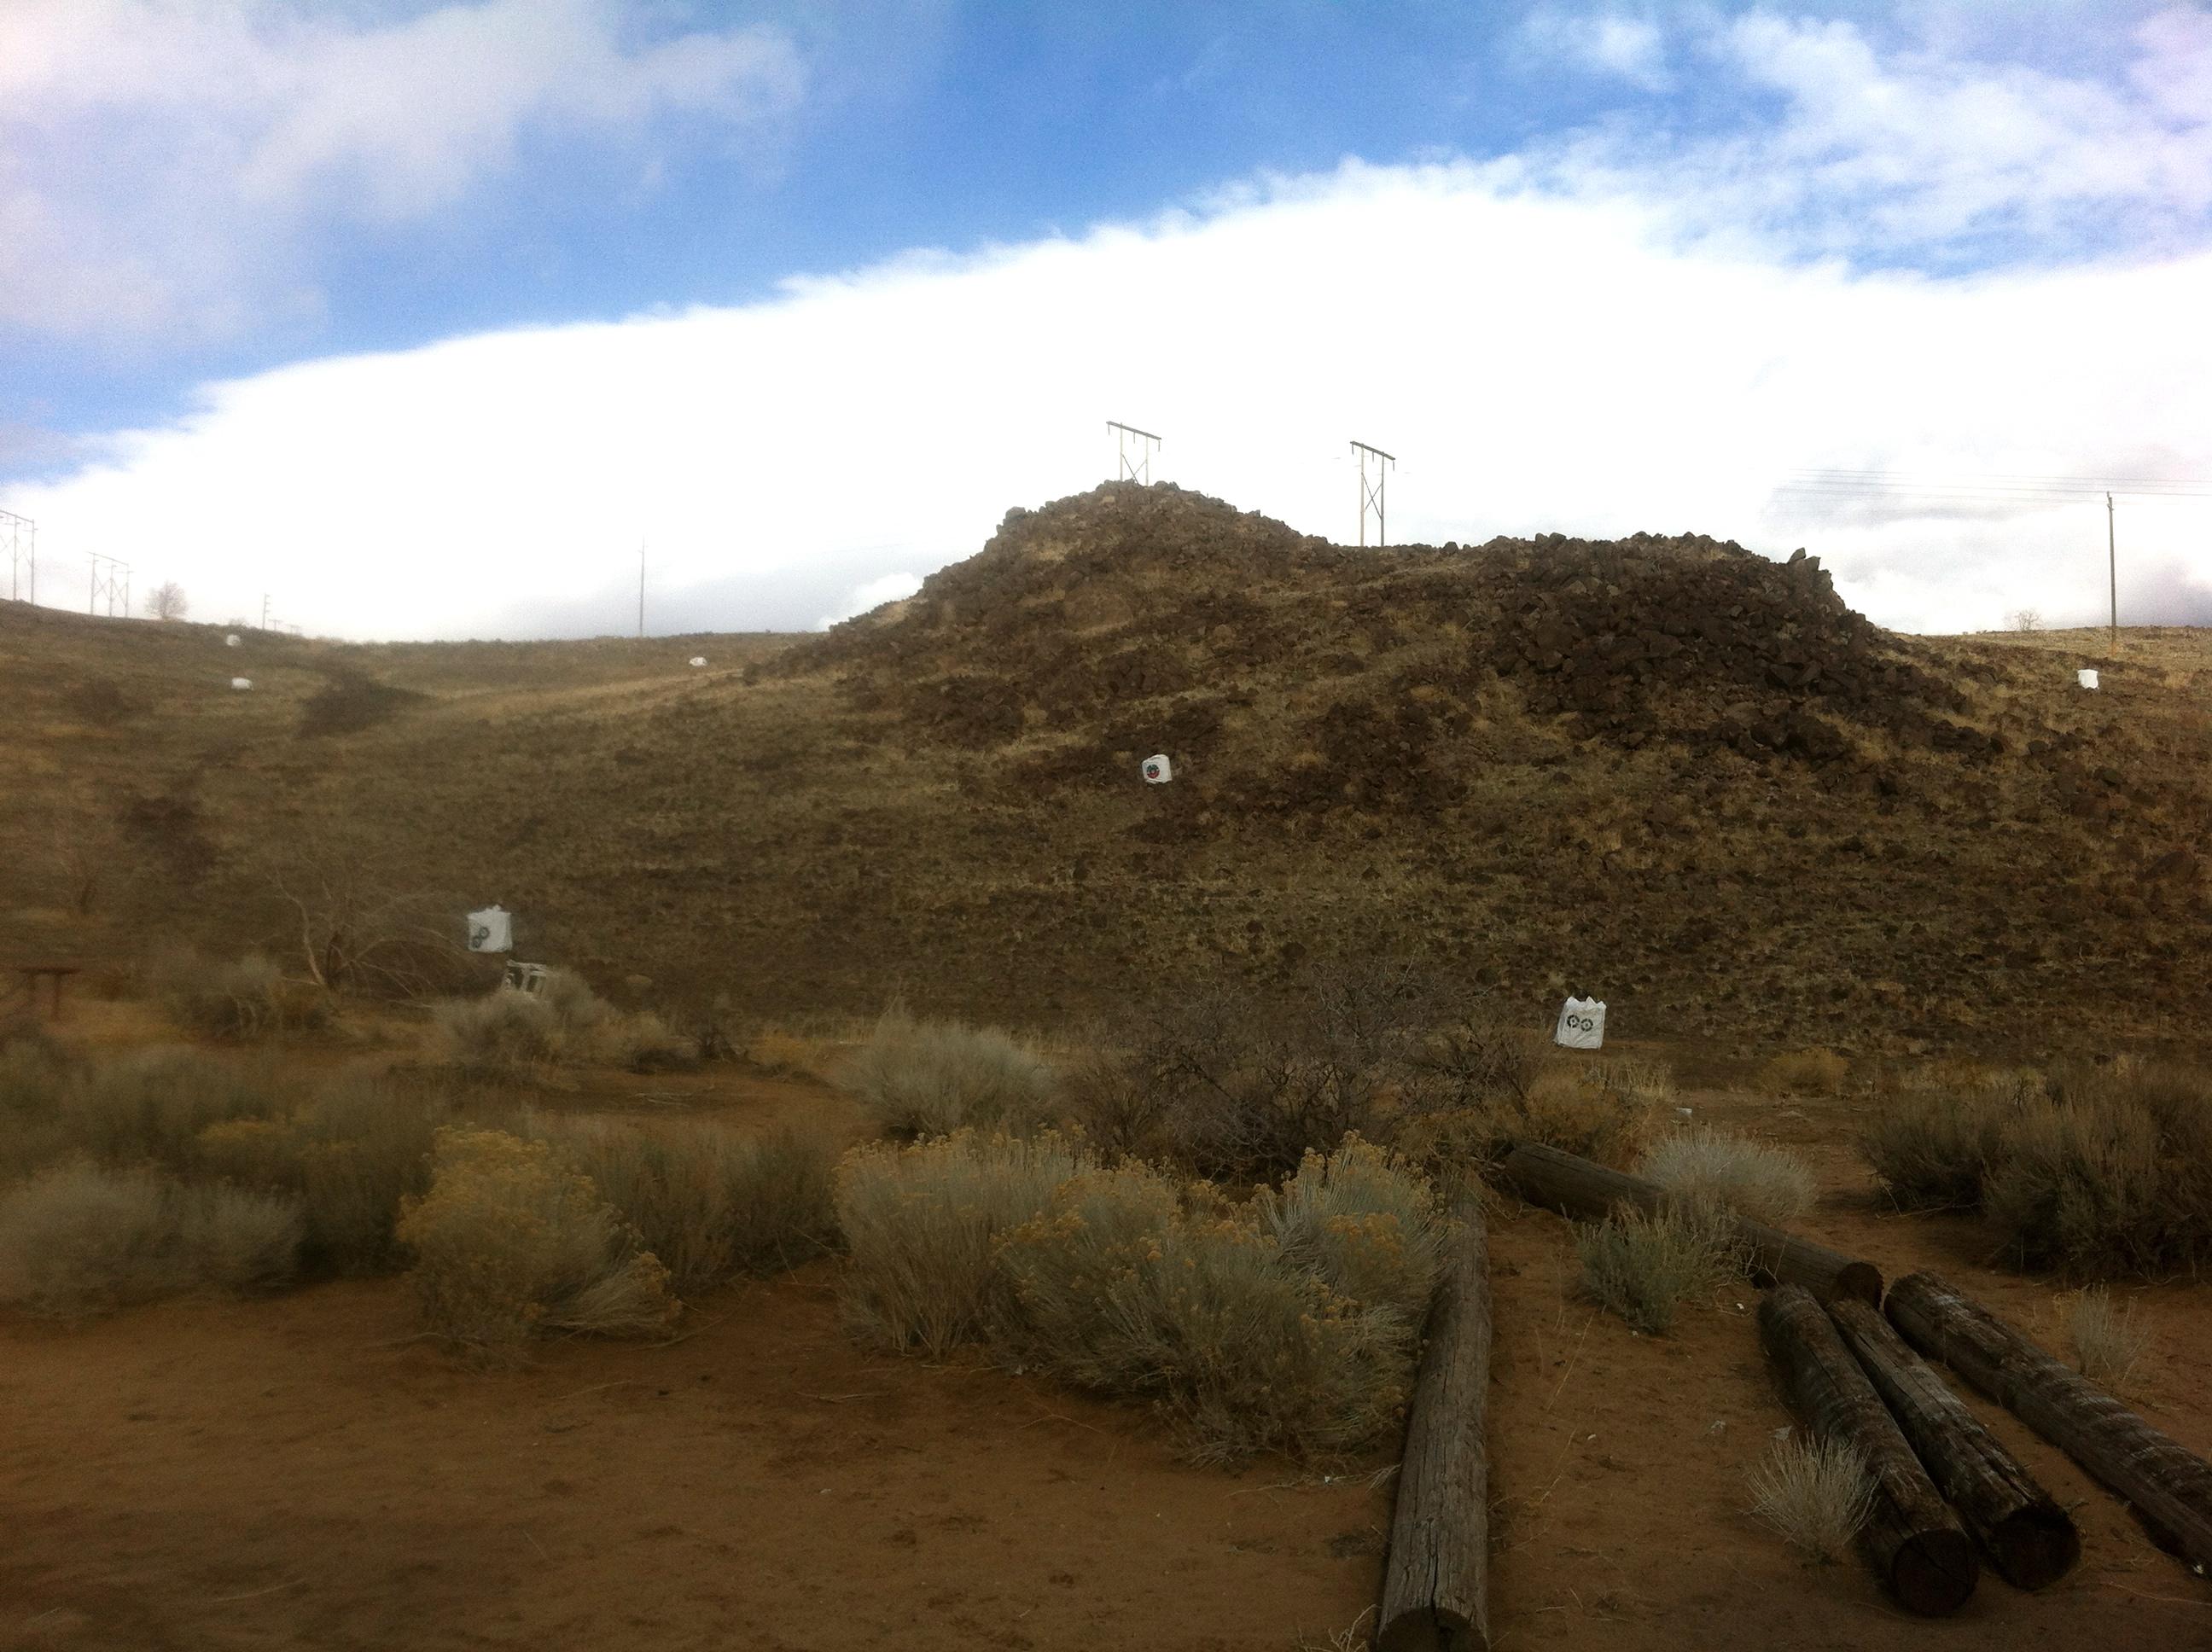 CCB Hell or High Water Shoot - Carson City, NV @ Clear Creek Bowmen Archery Range